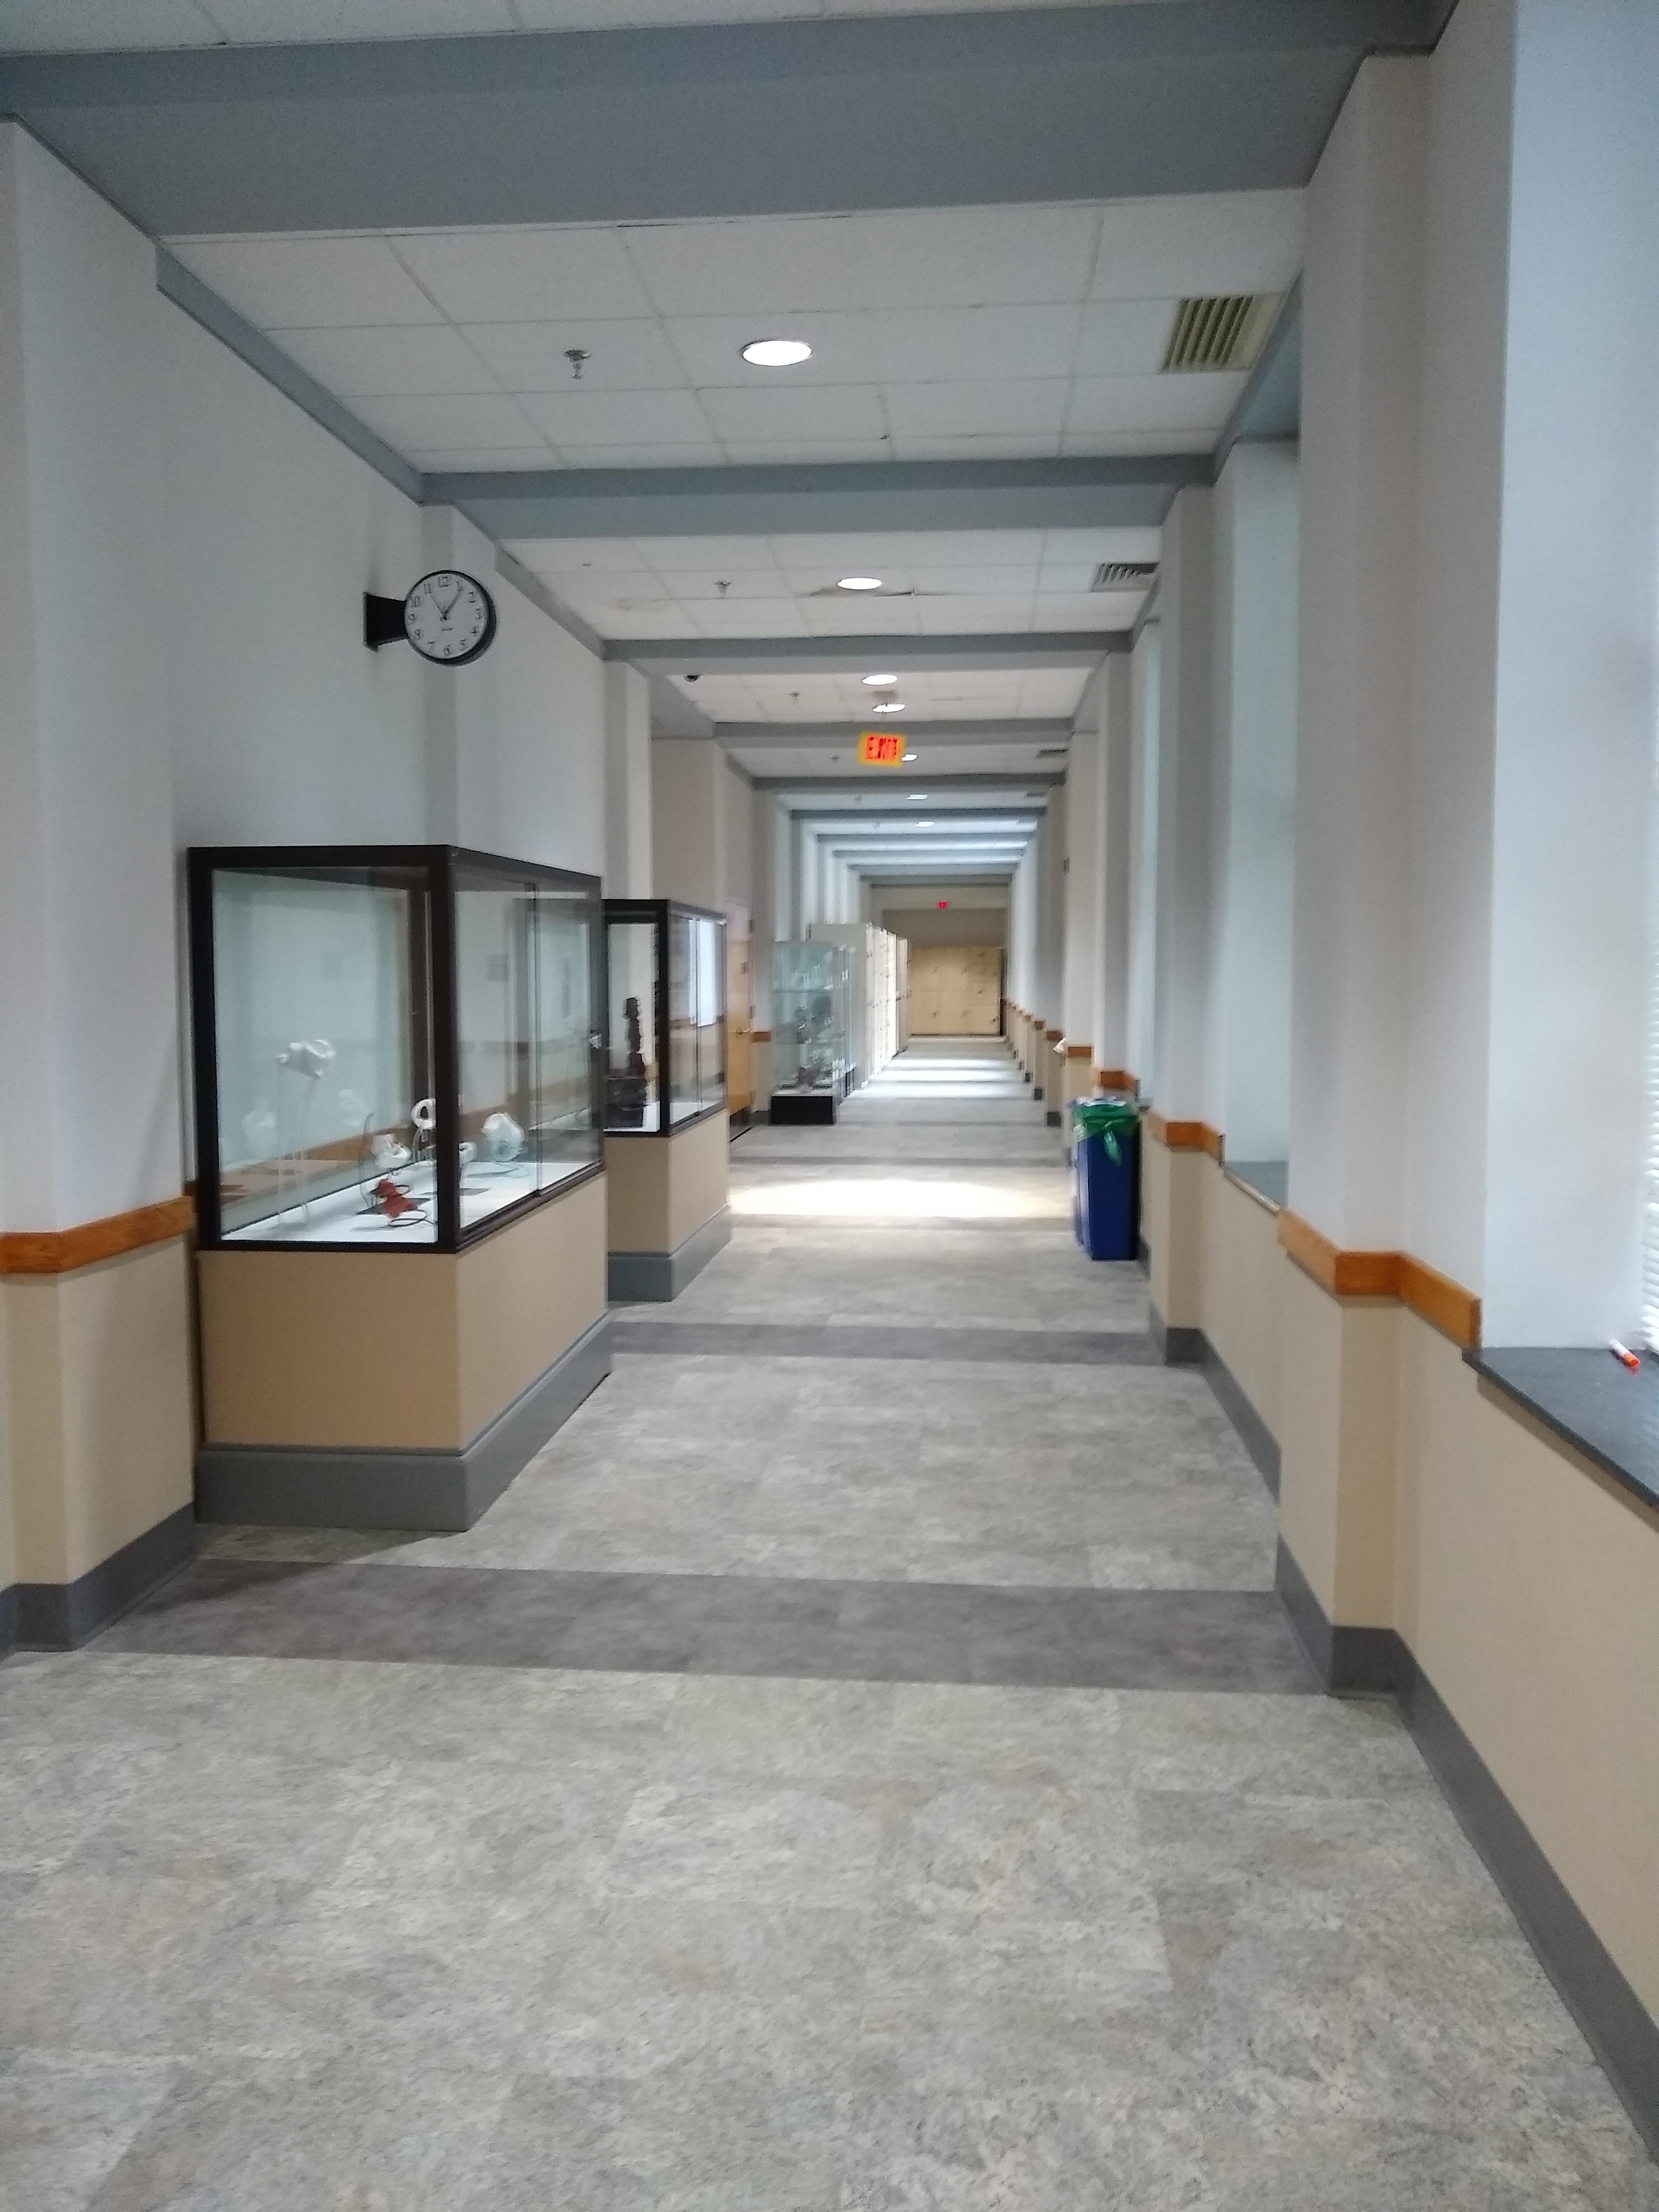 Hallway with art displays, 2020